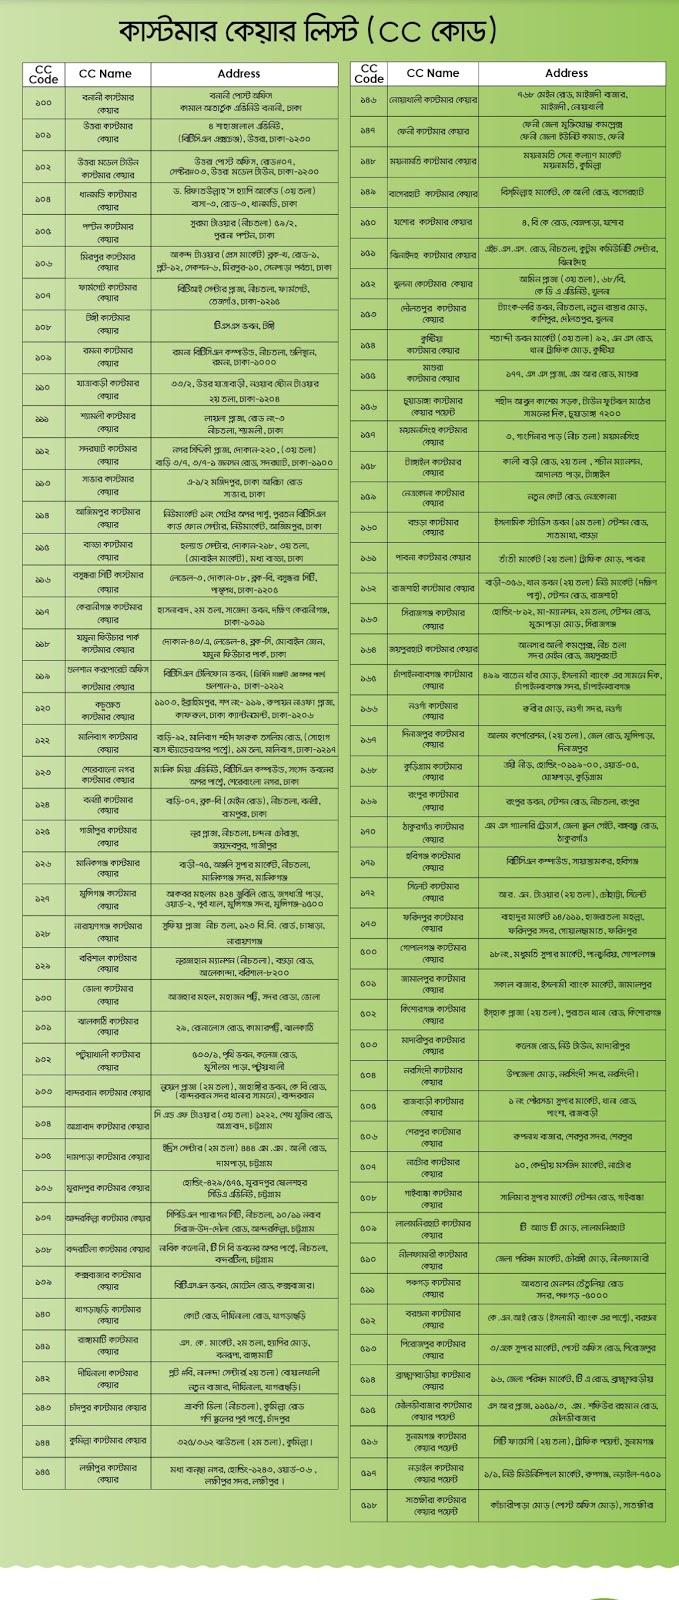 Teletalk Agami SIM CC Code List 2018